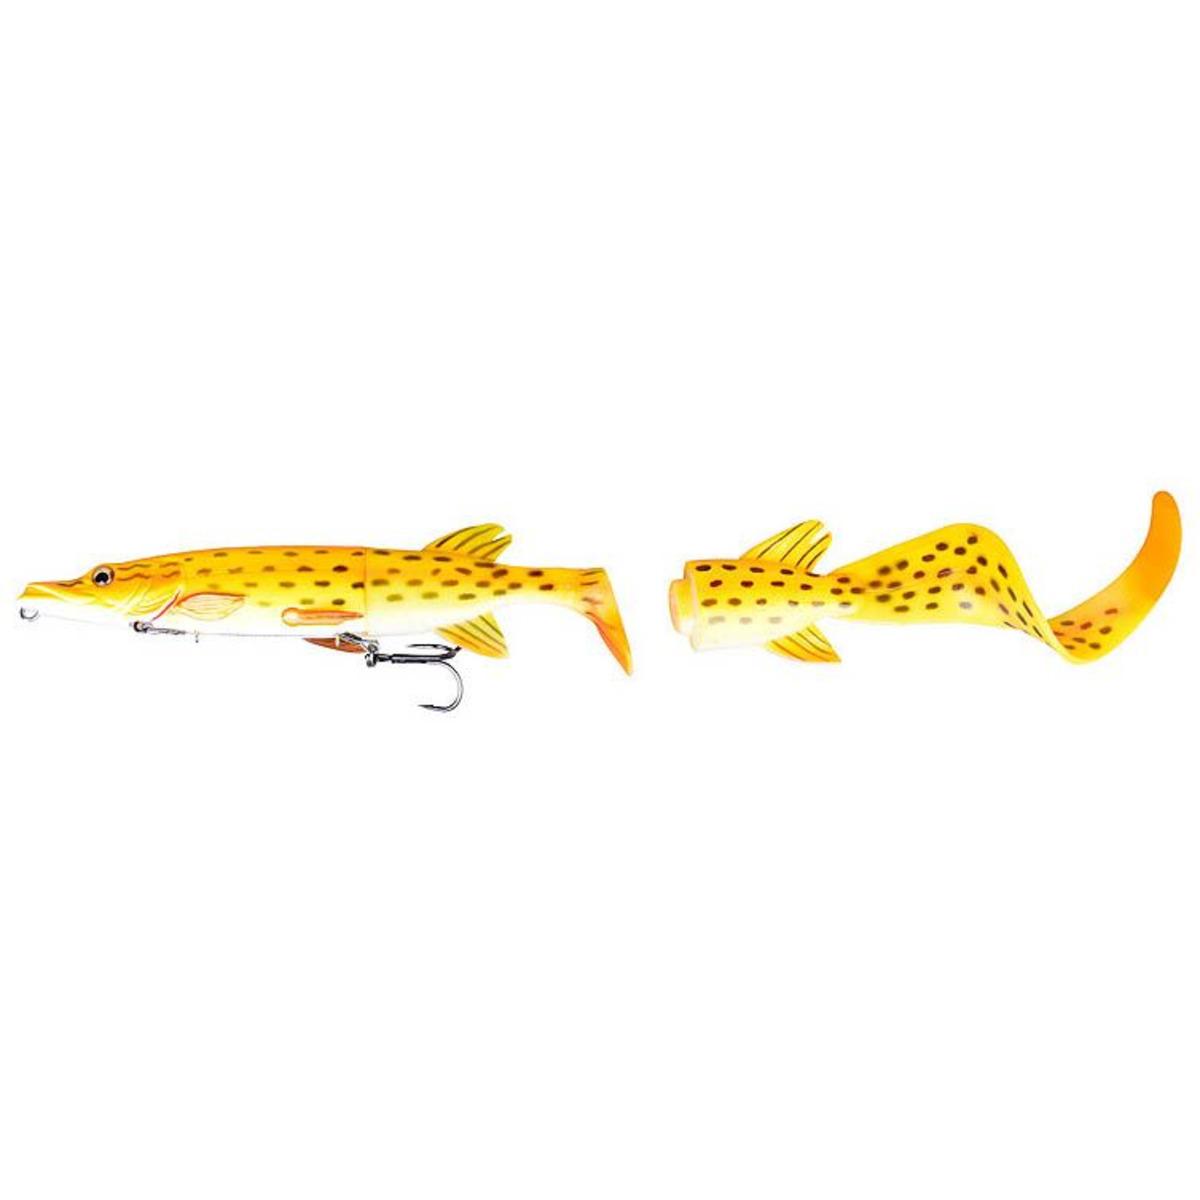 Savage Gear Hybrid Pike - 25 cm - 130 g - Albino Pike - Amo n.1/0 + 2/0